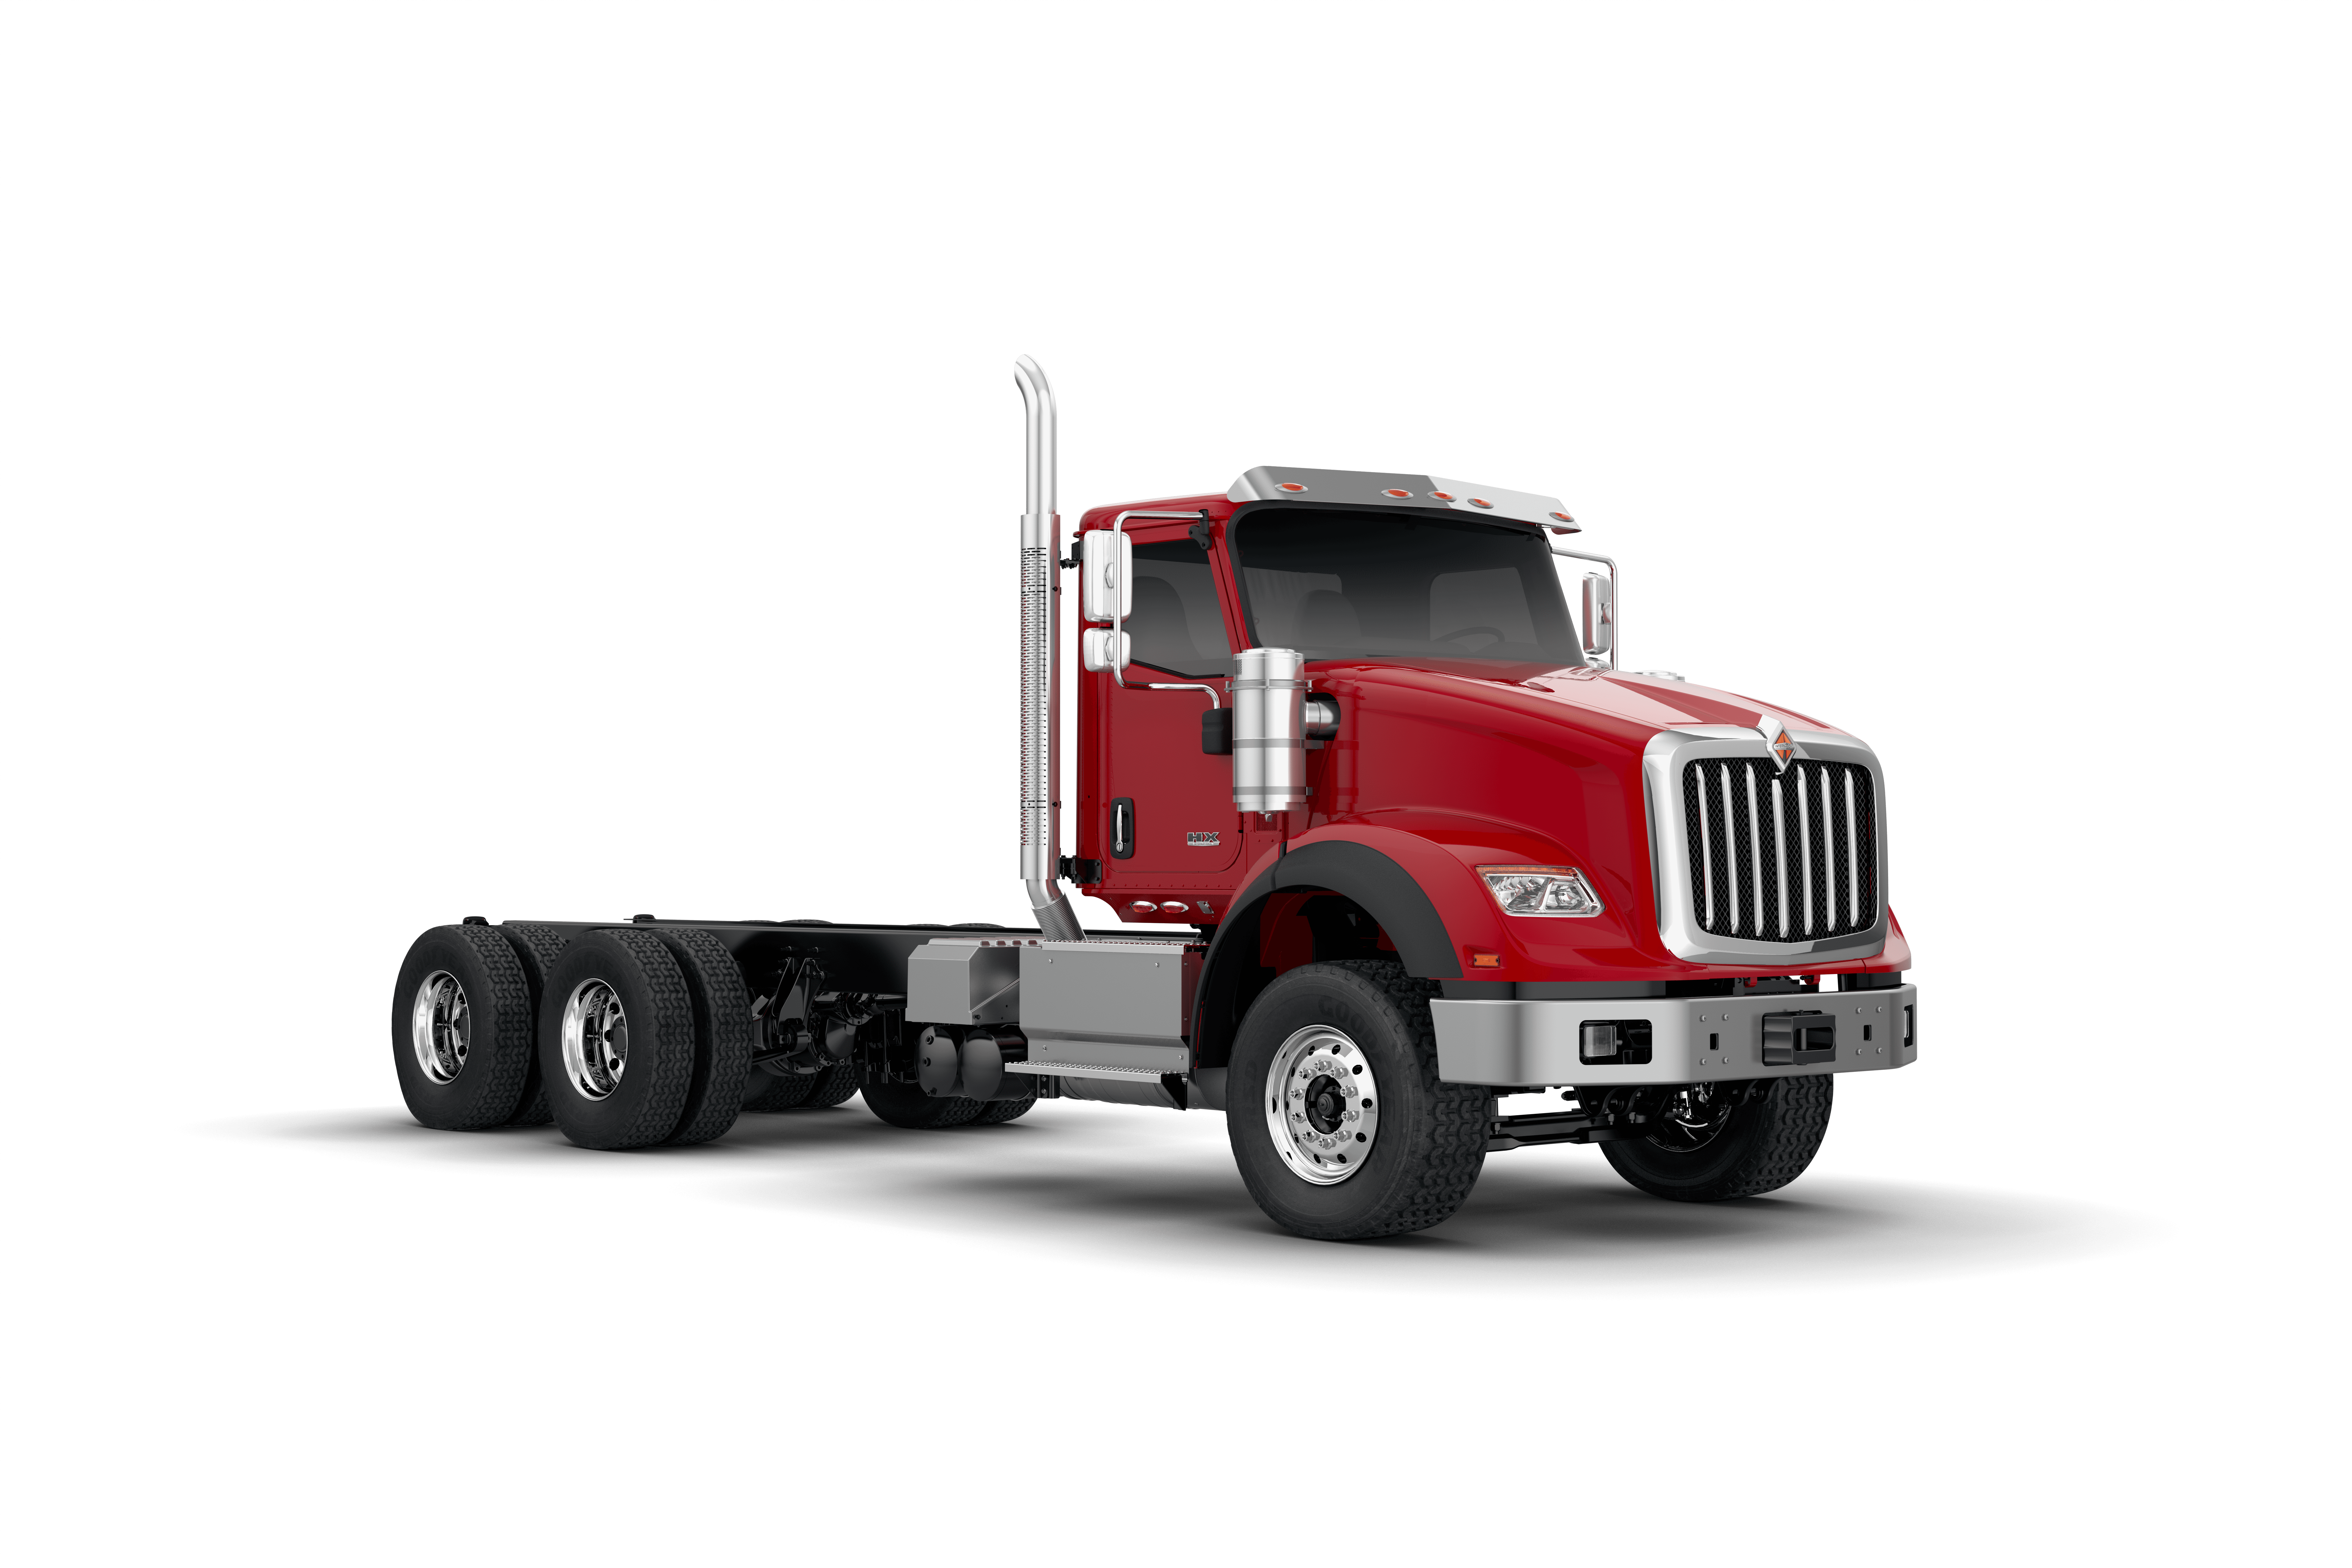 HX 620SERIES INTERNATIONAL TRUCK